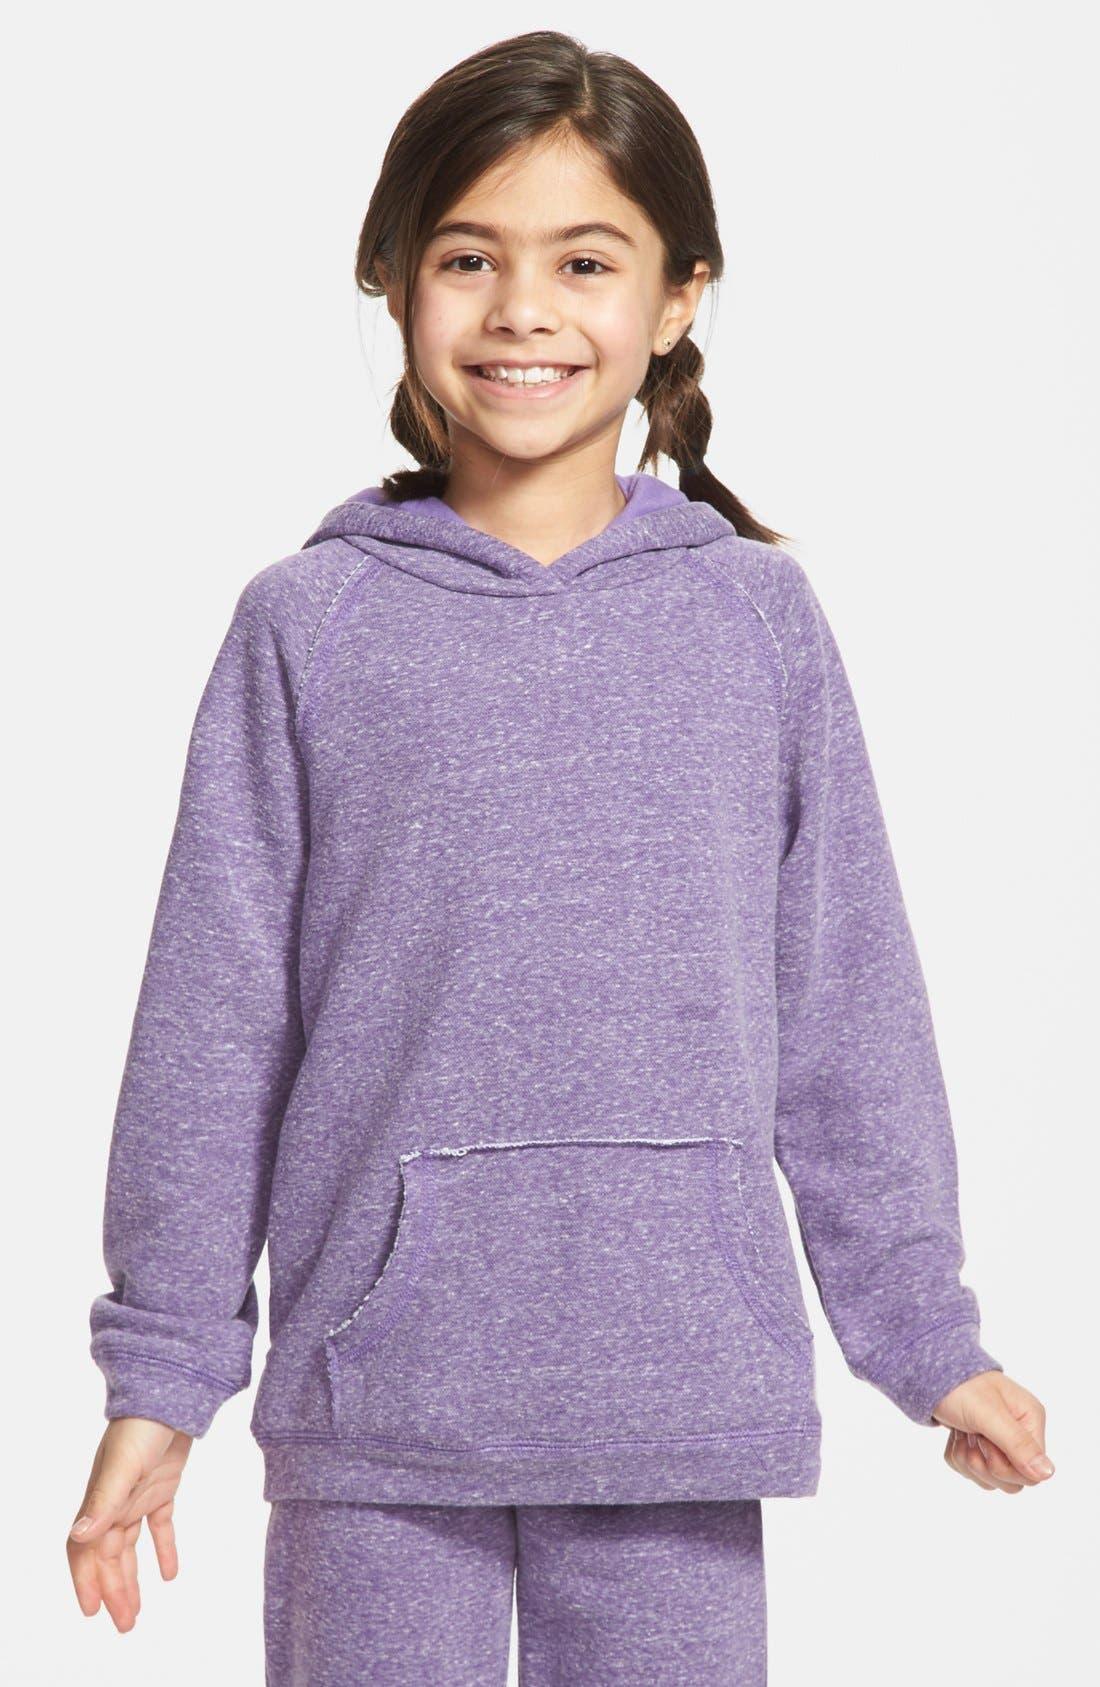 Main Image - Peek 'Logan' Pullover Fleece Hoodie (Toddler Girls, Little Girls & Big Girls)